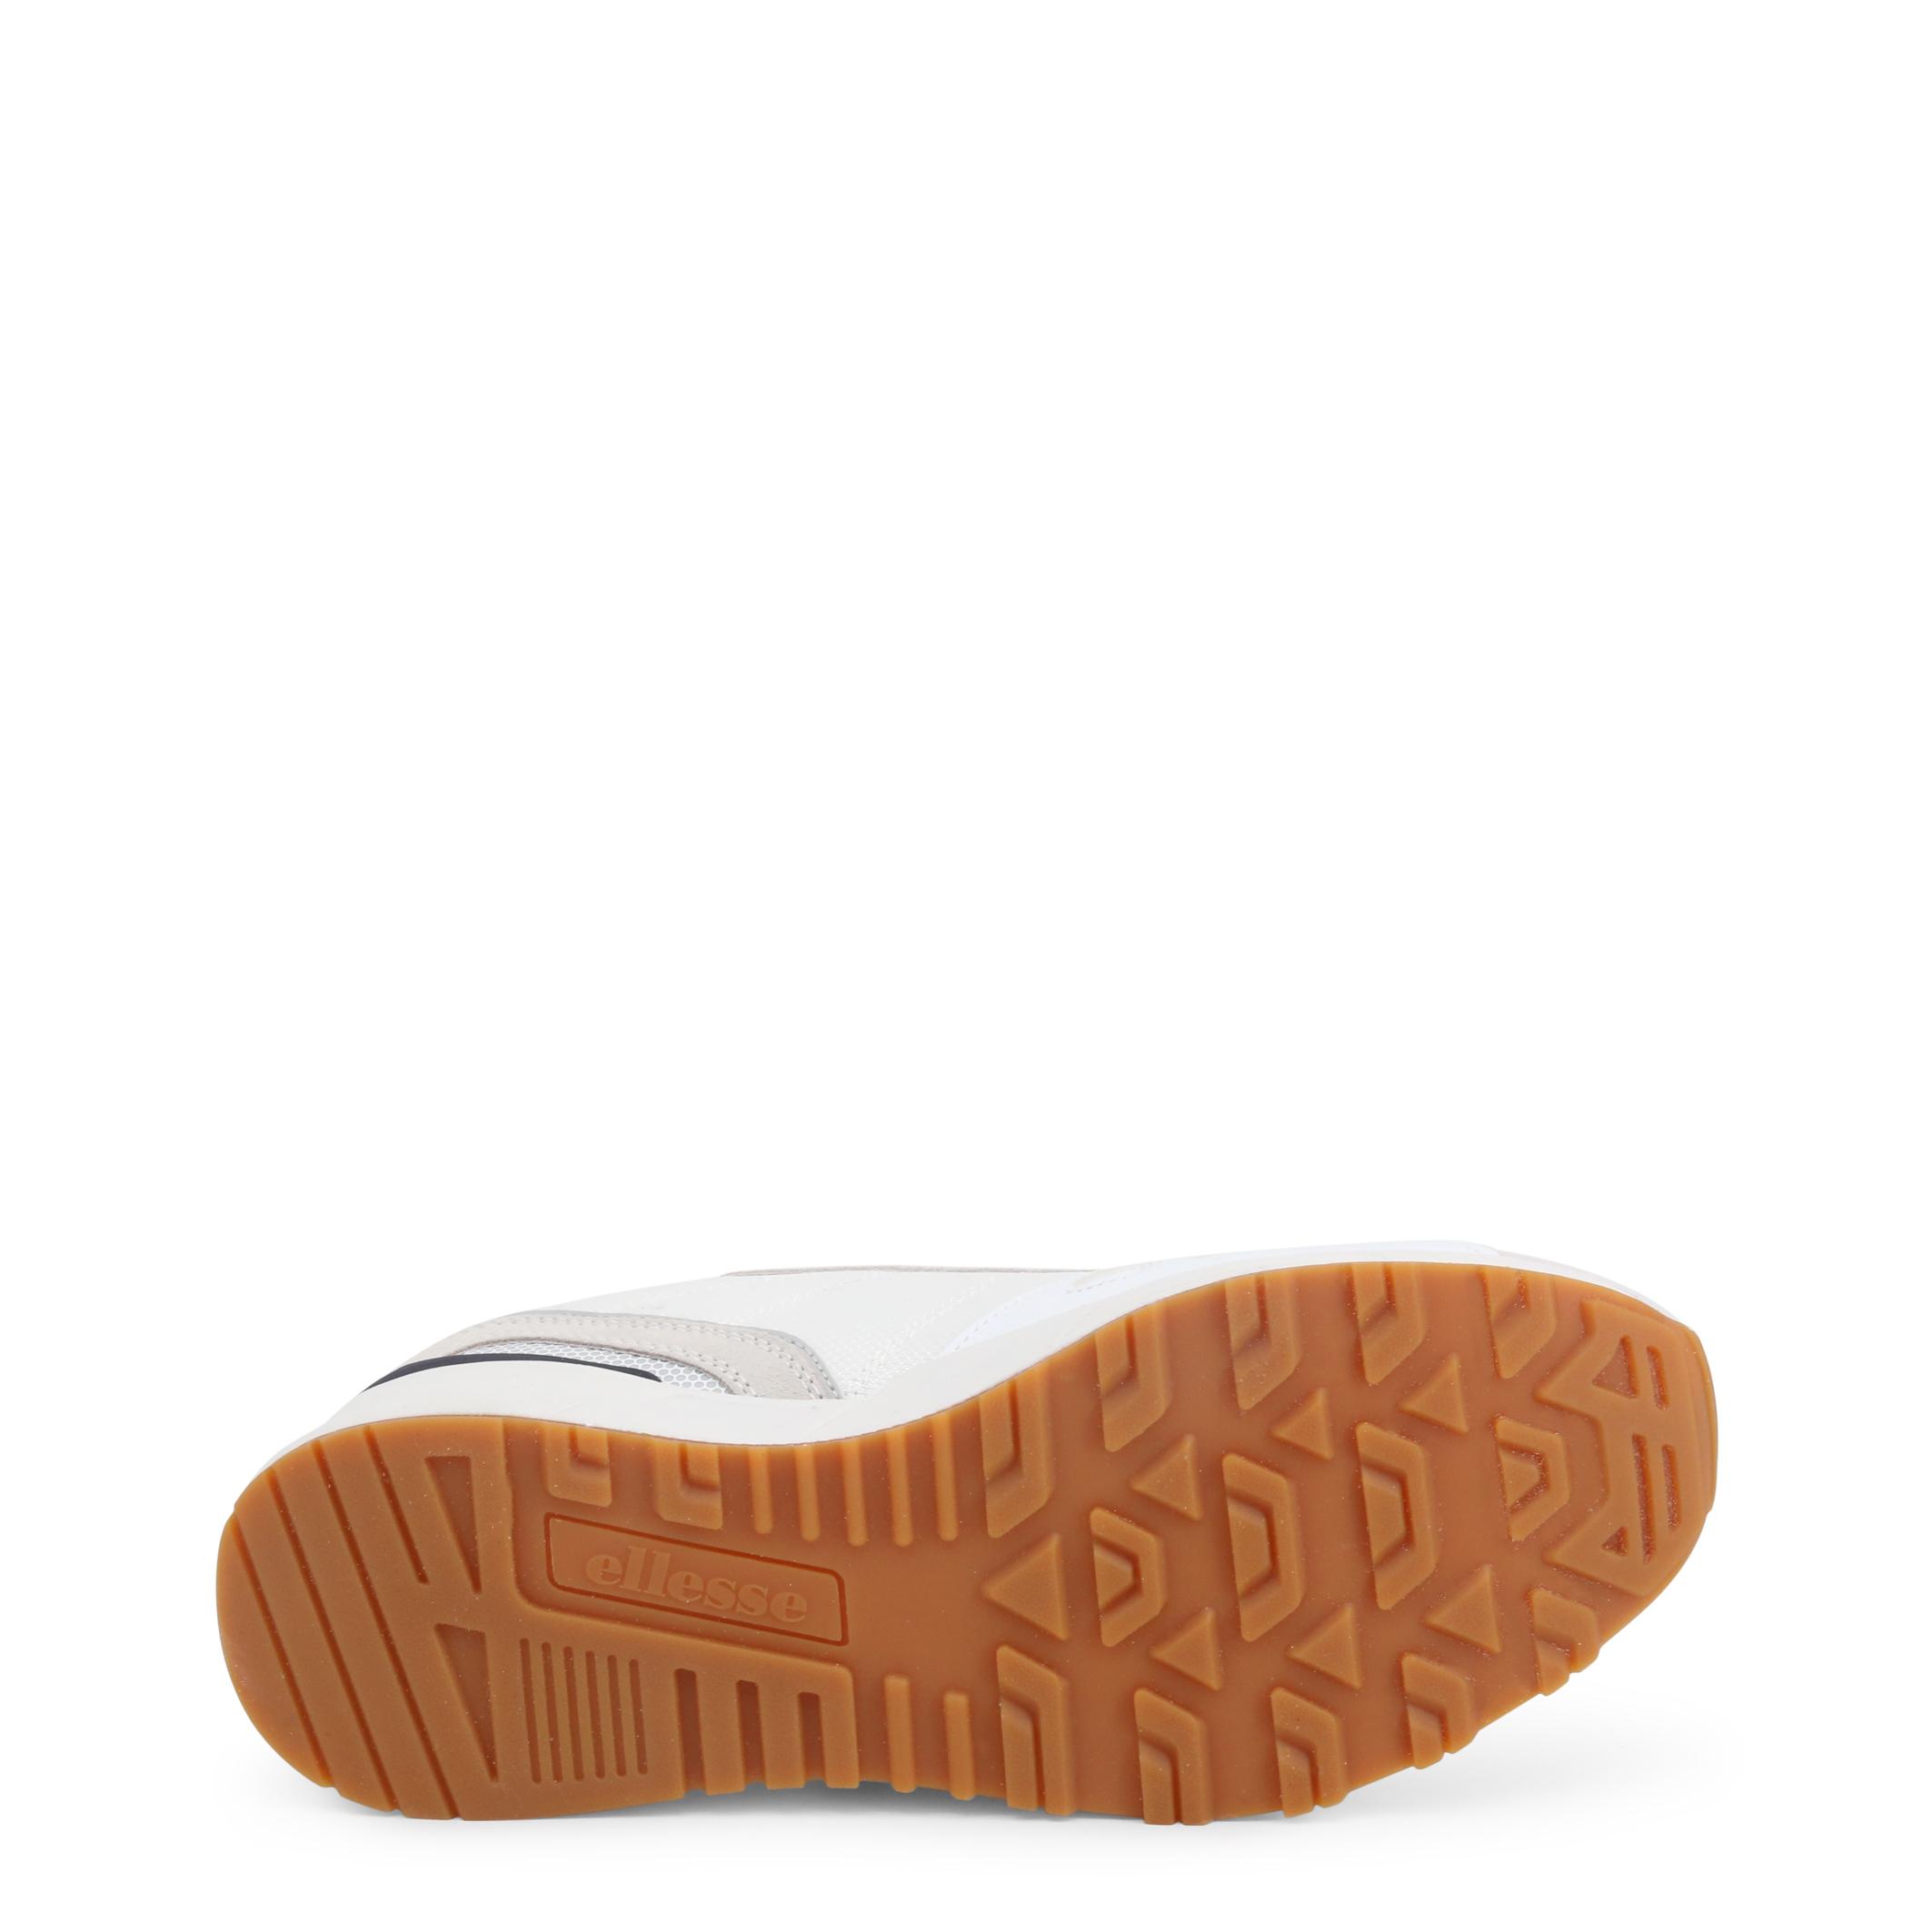 Baskets / Sport  Ellesse EL01M60411_03 white